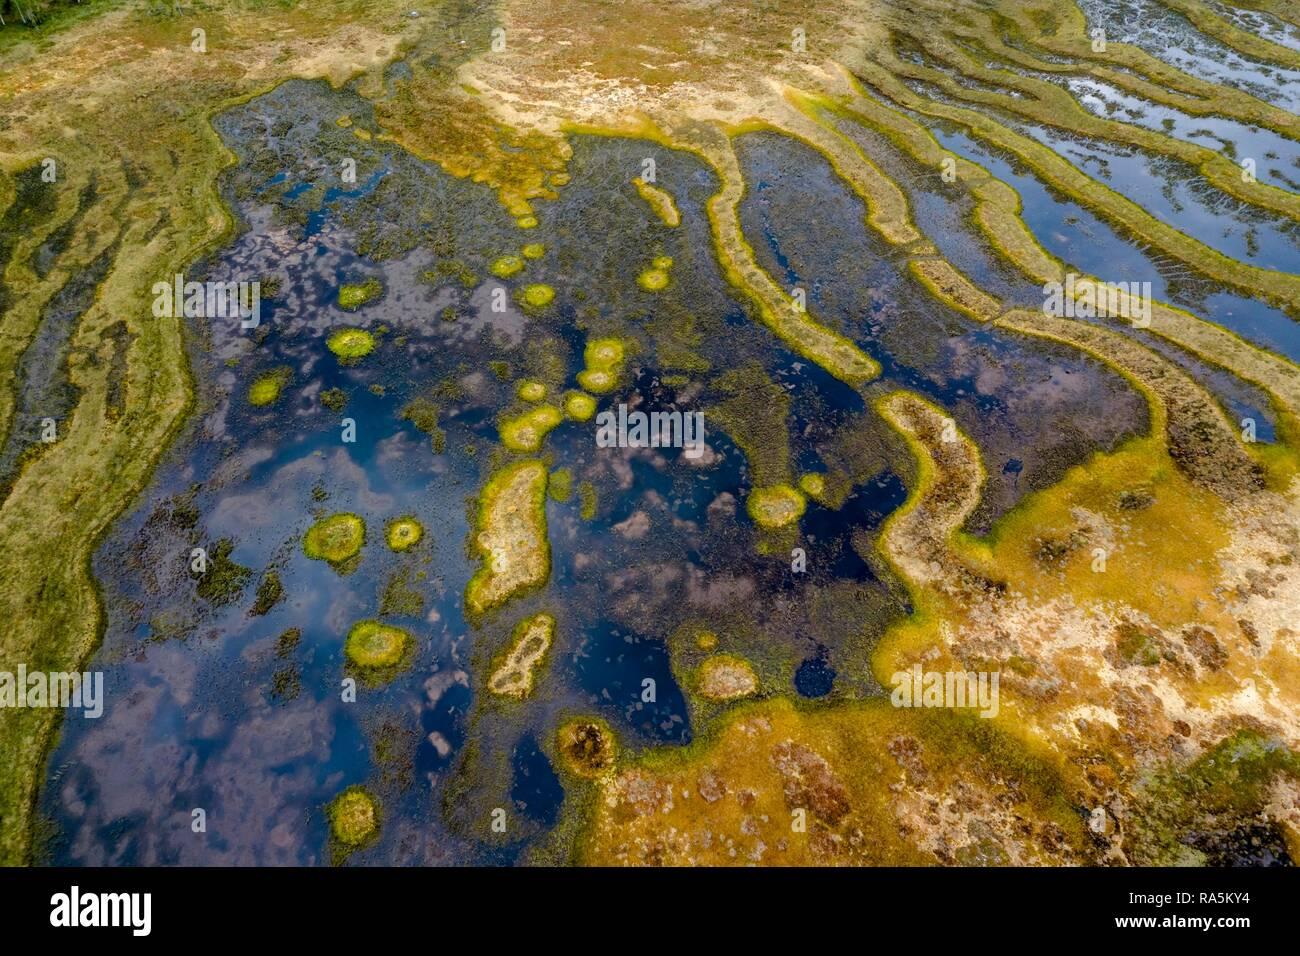 Drone shot, moor landscape, wetland, abstract structures, Junsele, Västernorrlands län, Sweden Stock Photo